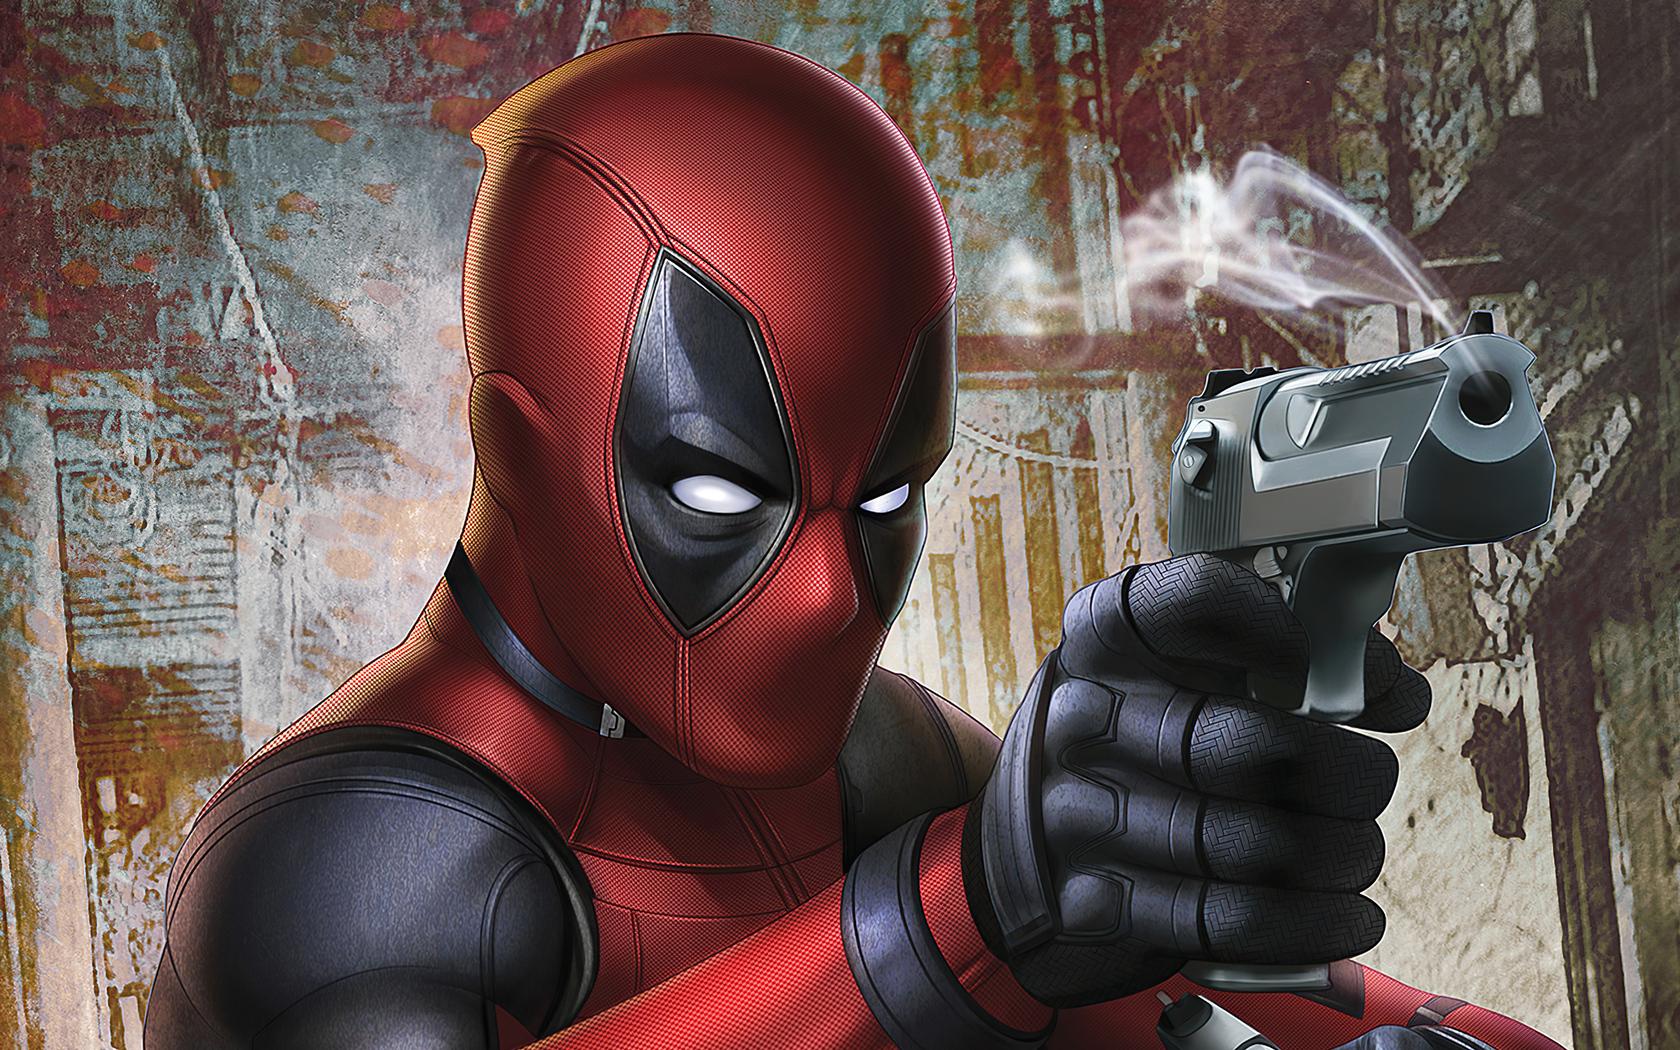 deadpool-gun-artwork-4k-ku.jpg